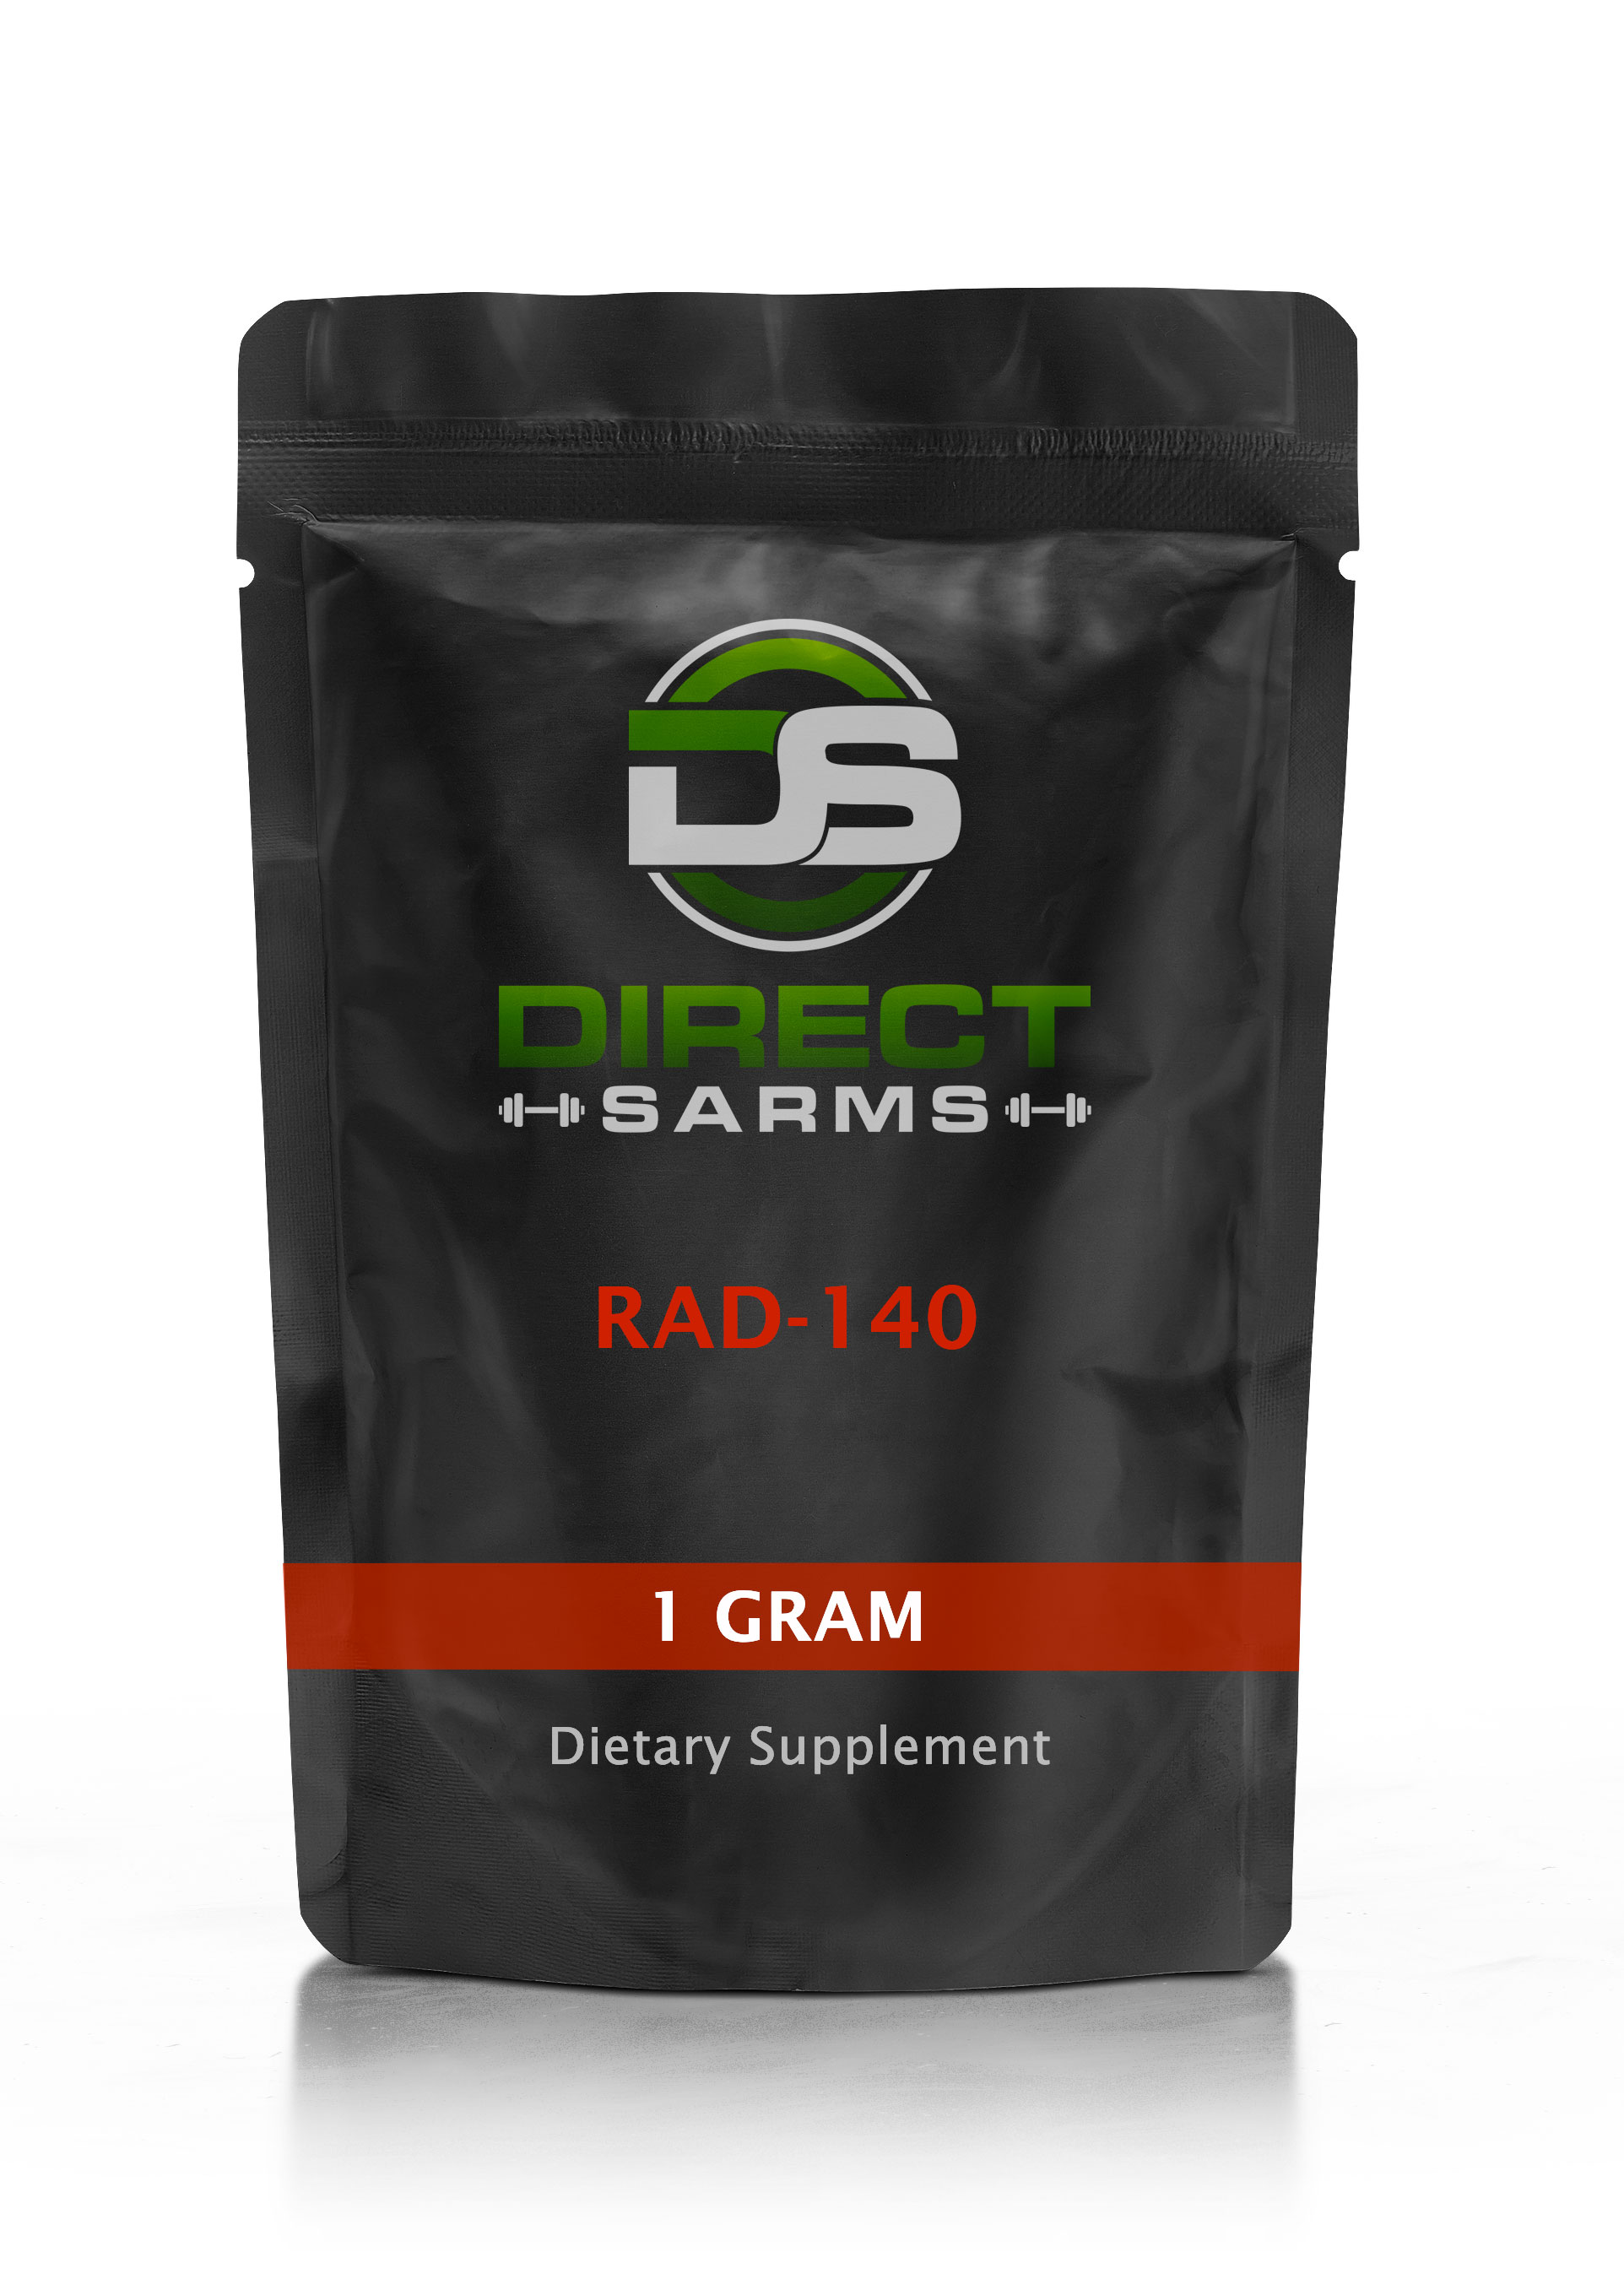 RAD-140 - Powder